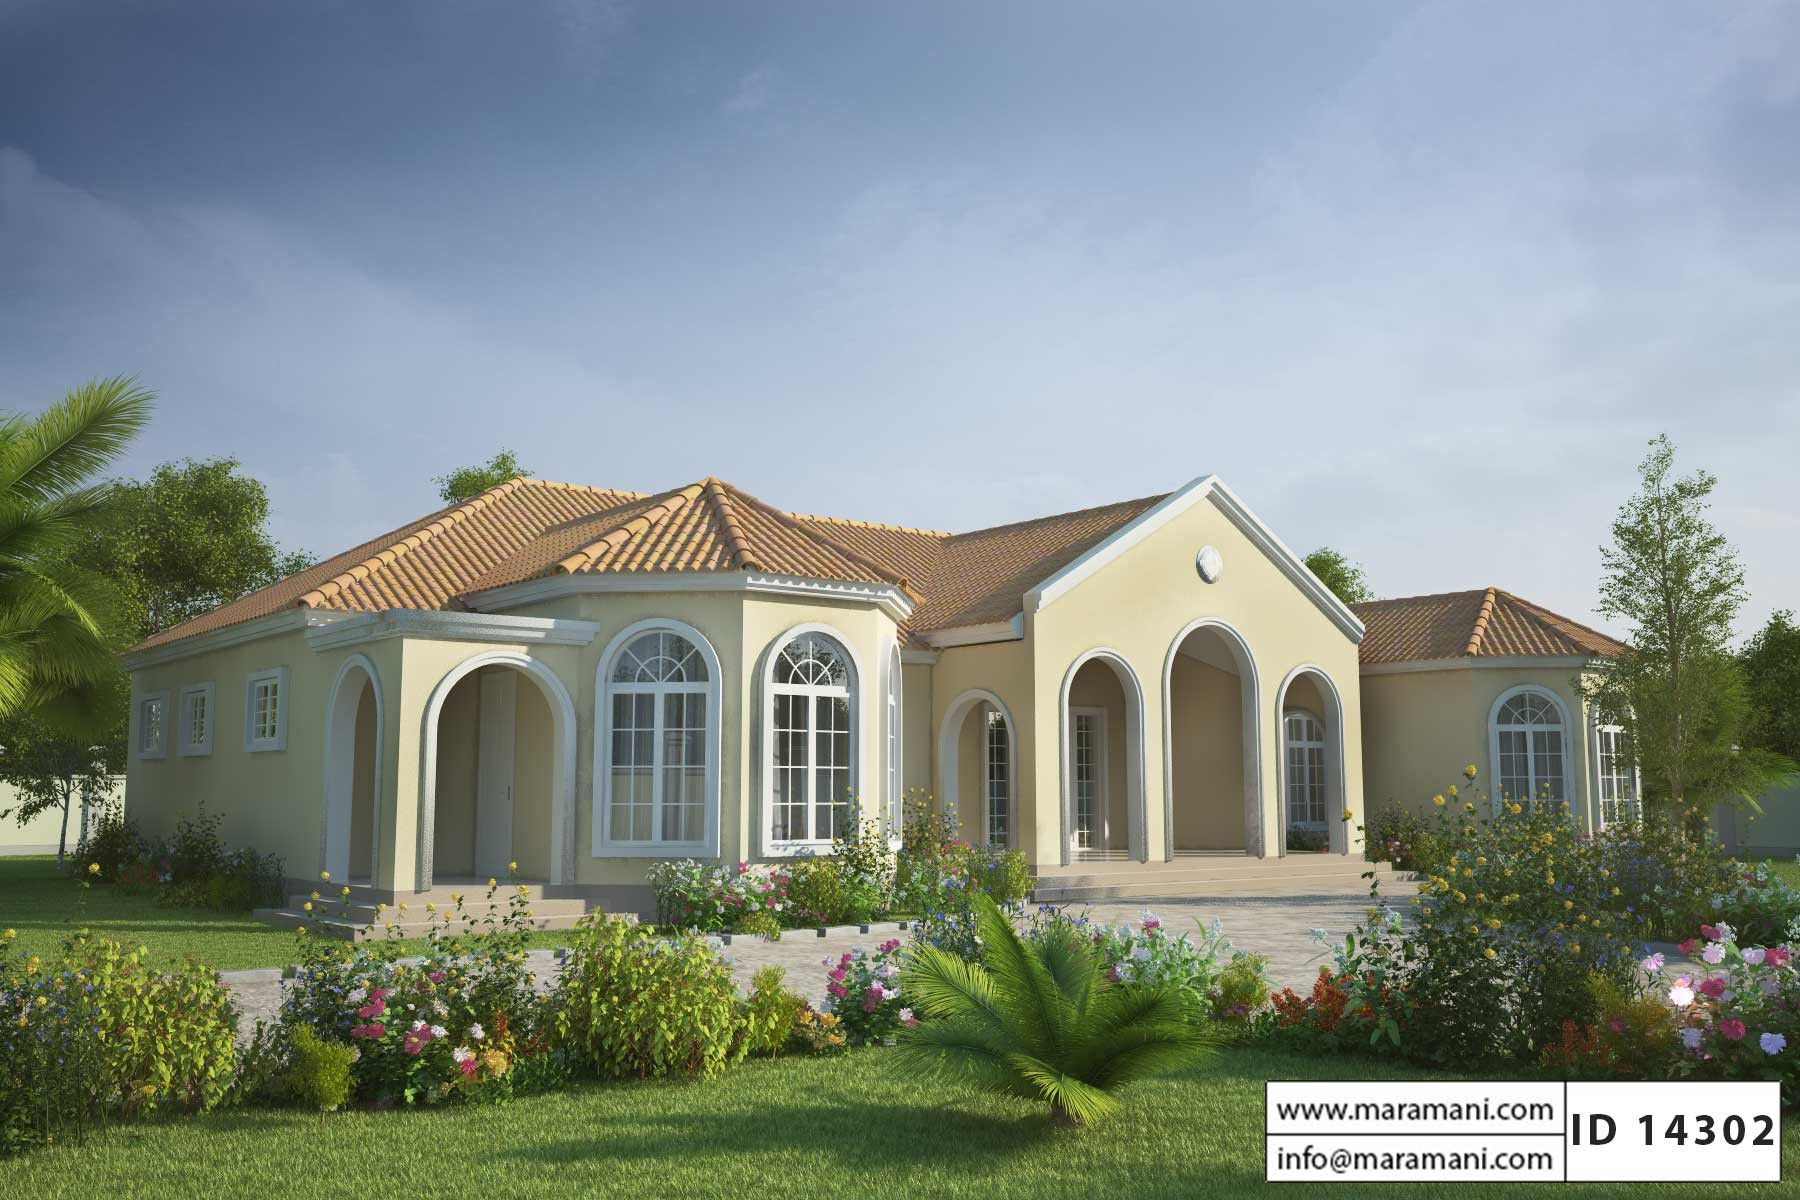 Mediterranean Style House Plan Id 14302 House Plans By Maramani Mediterranean House Designs Mediterranean Style House Plans Beach House Plans